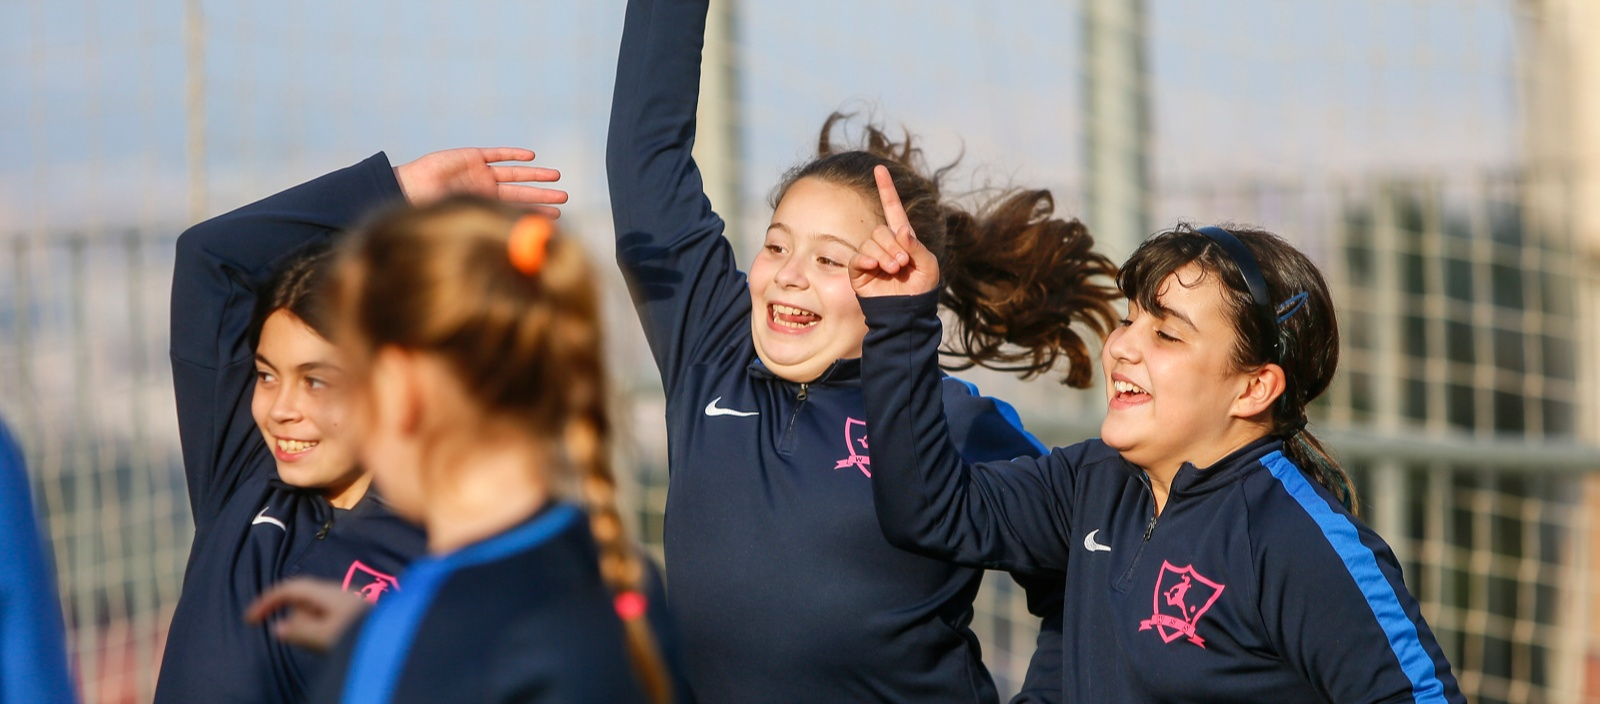 El departament de psicologia esportiva de la Women's Soccer School Barcelona